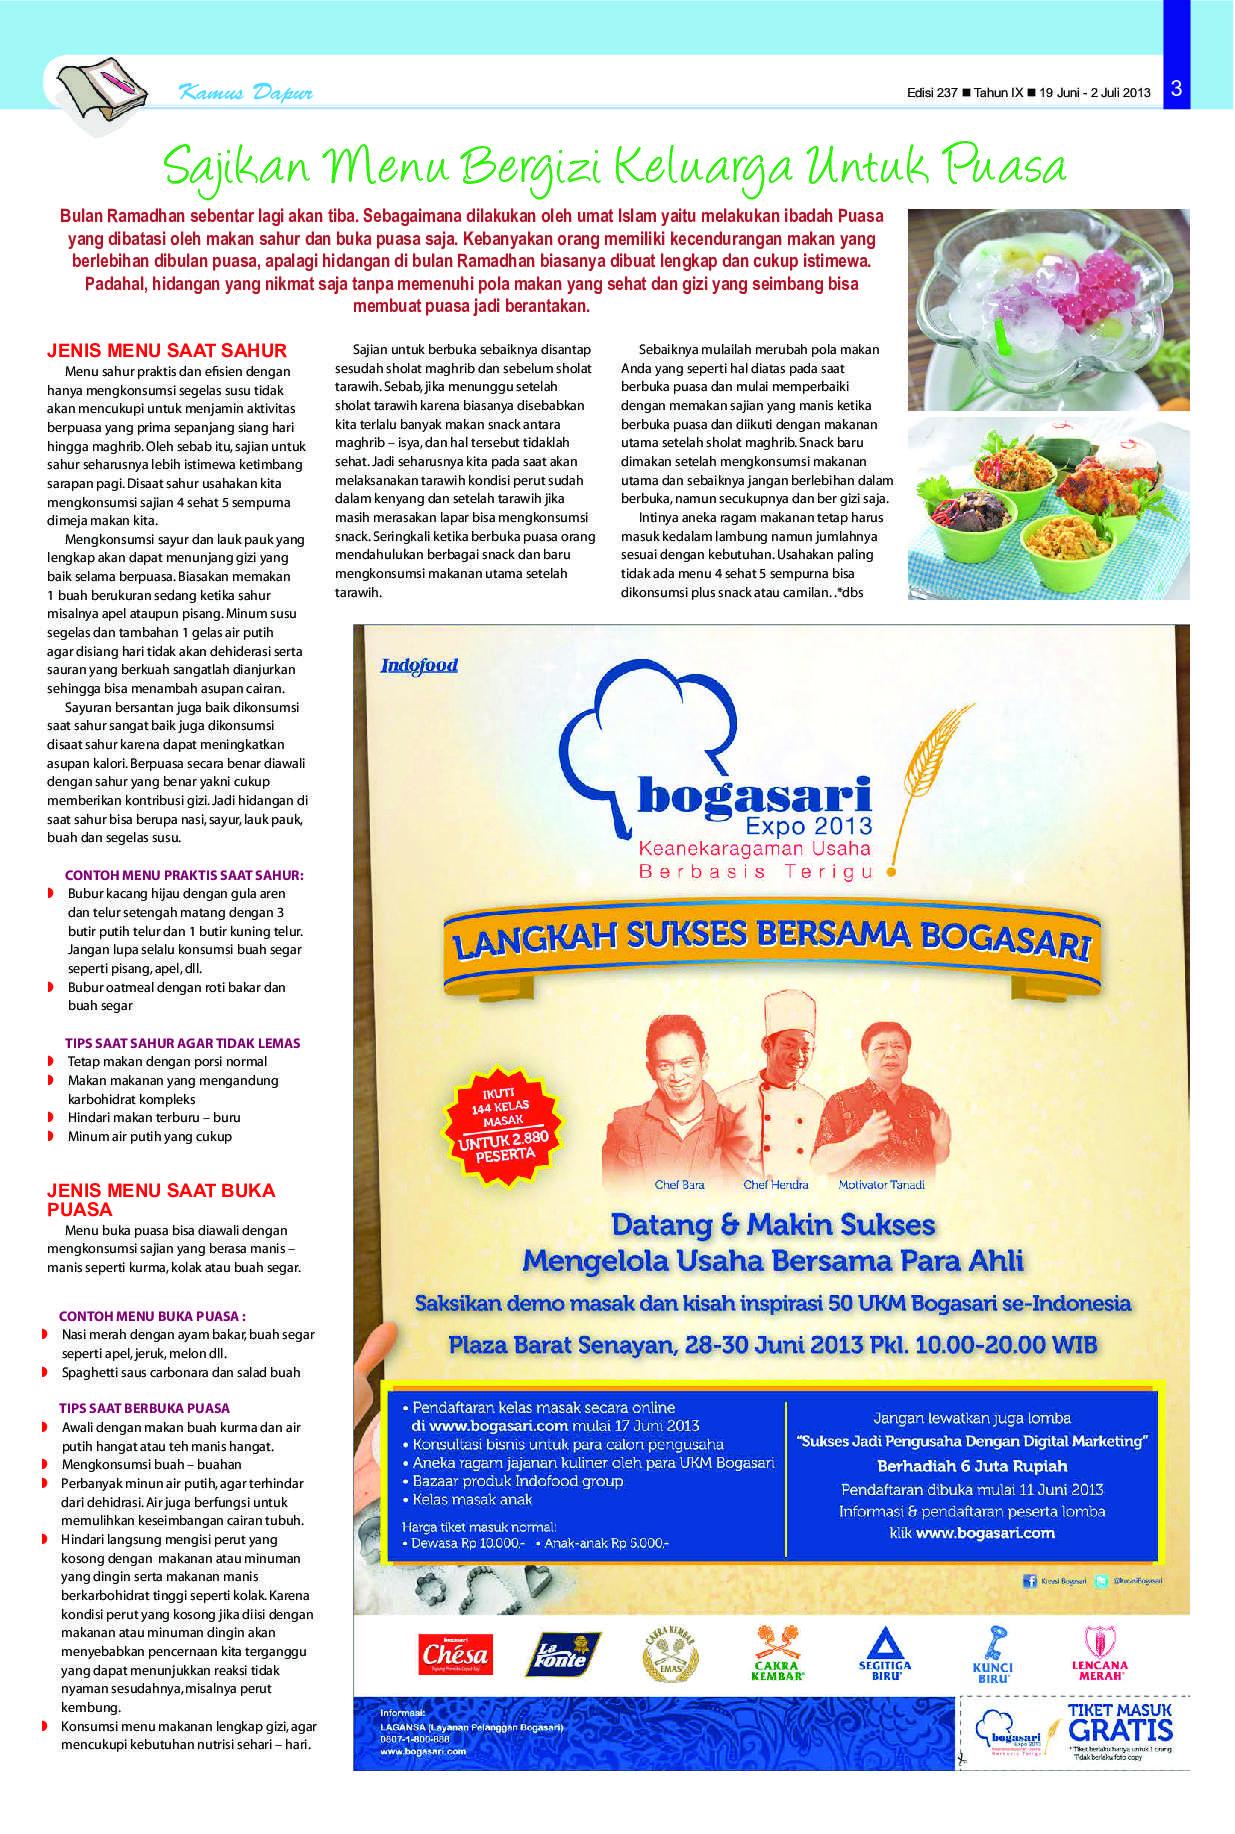 Lezat Magazine 19 02 July 2013 Gramedia Digital